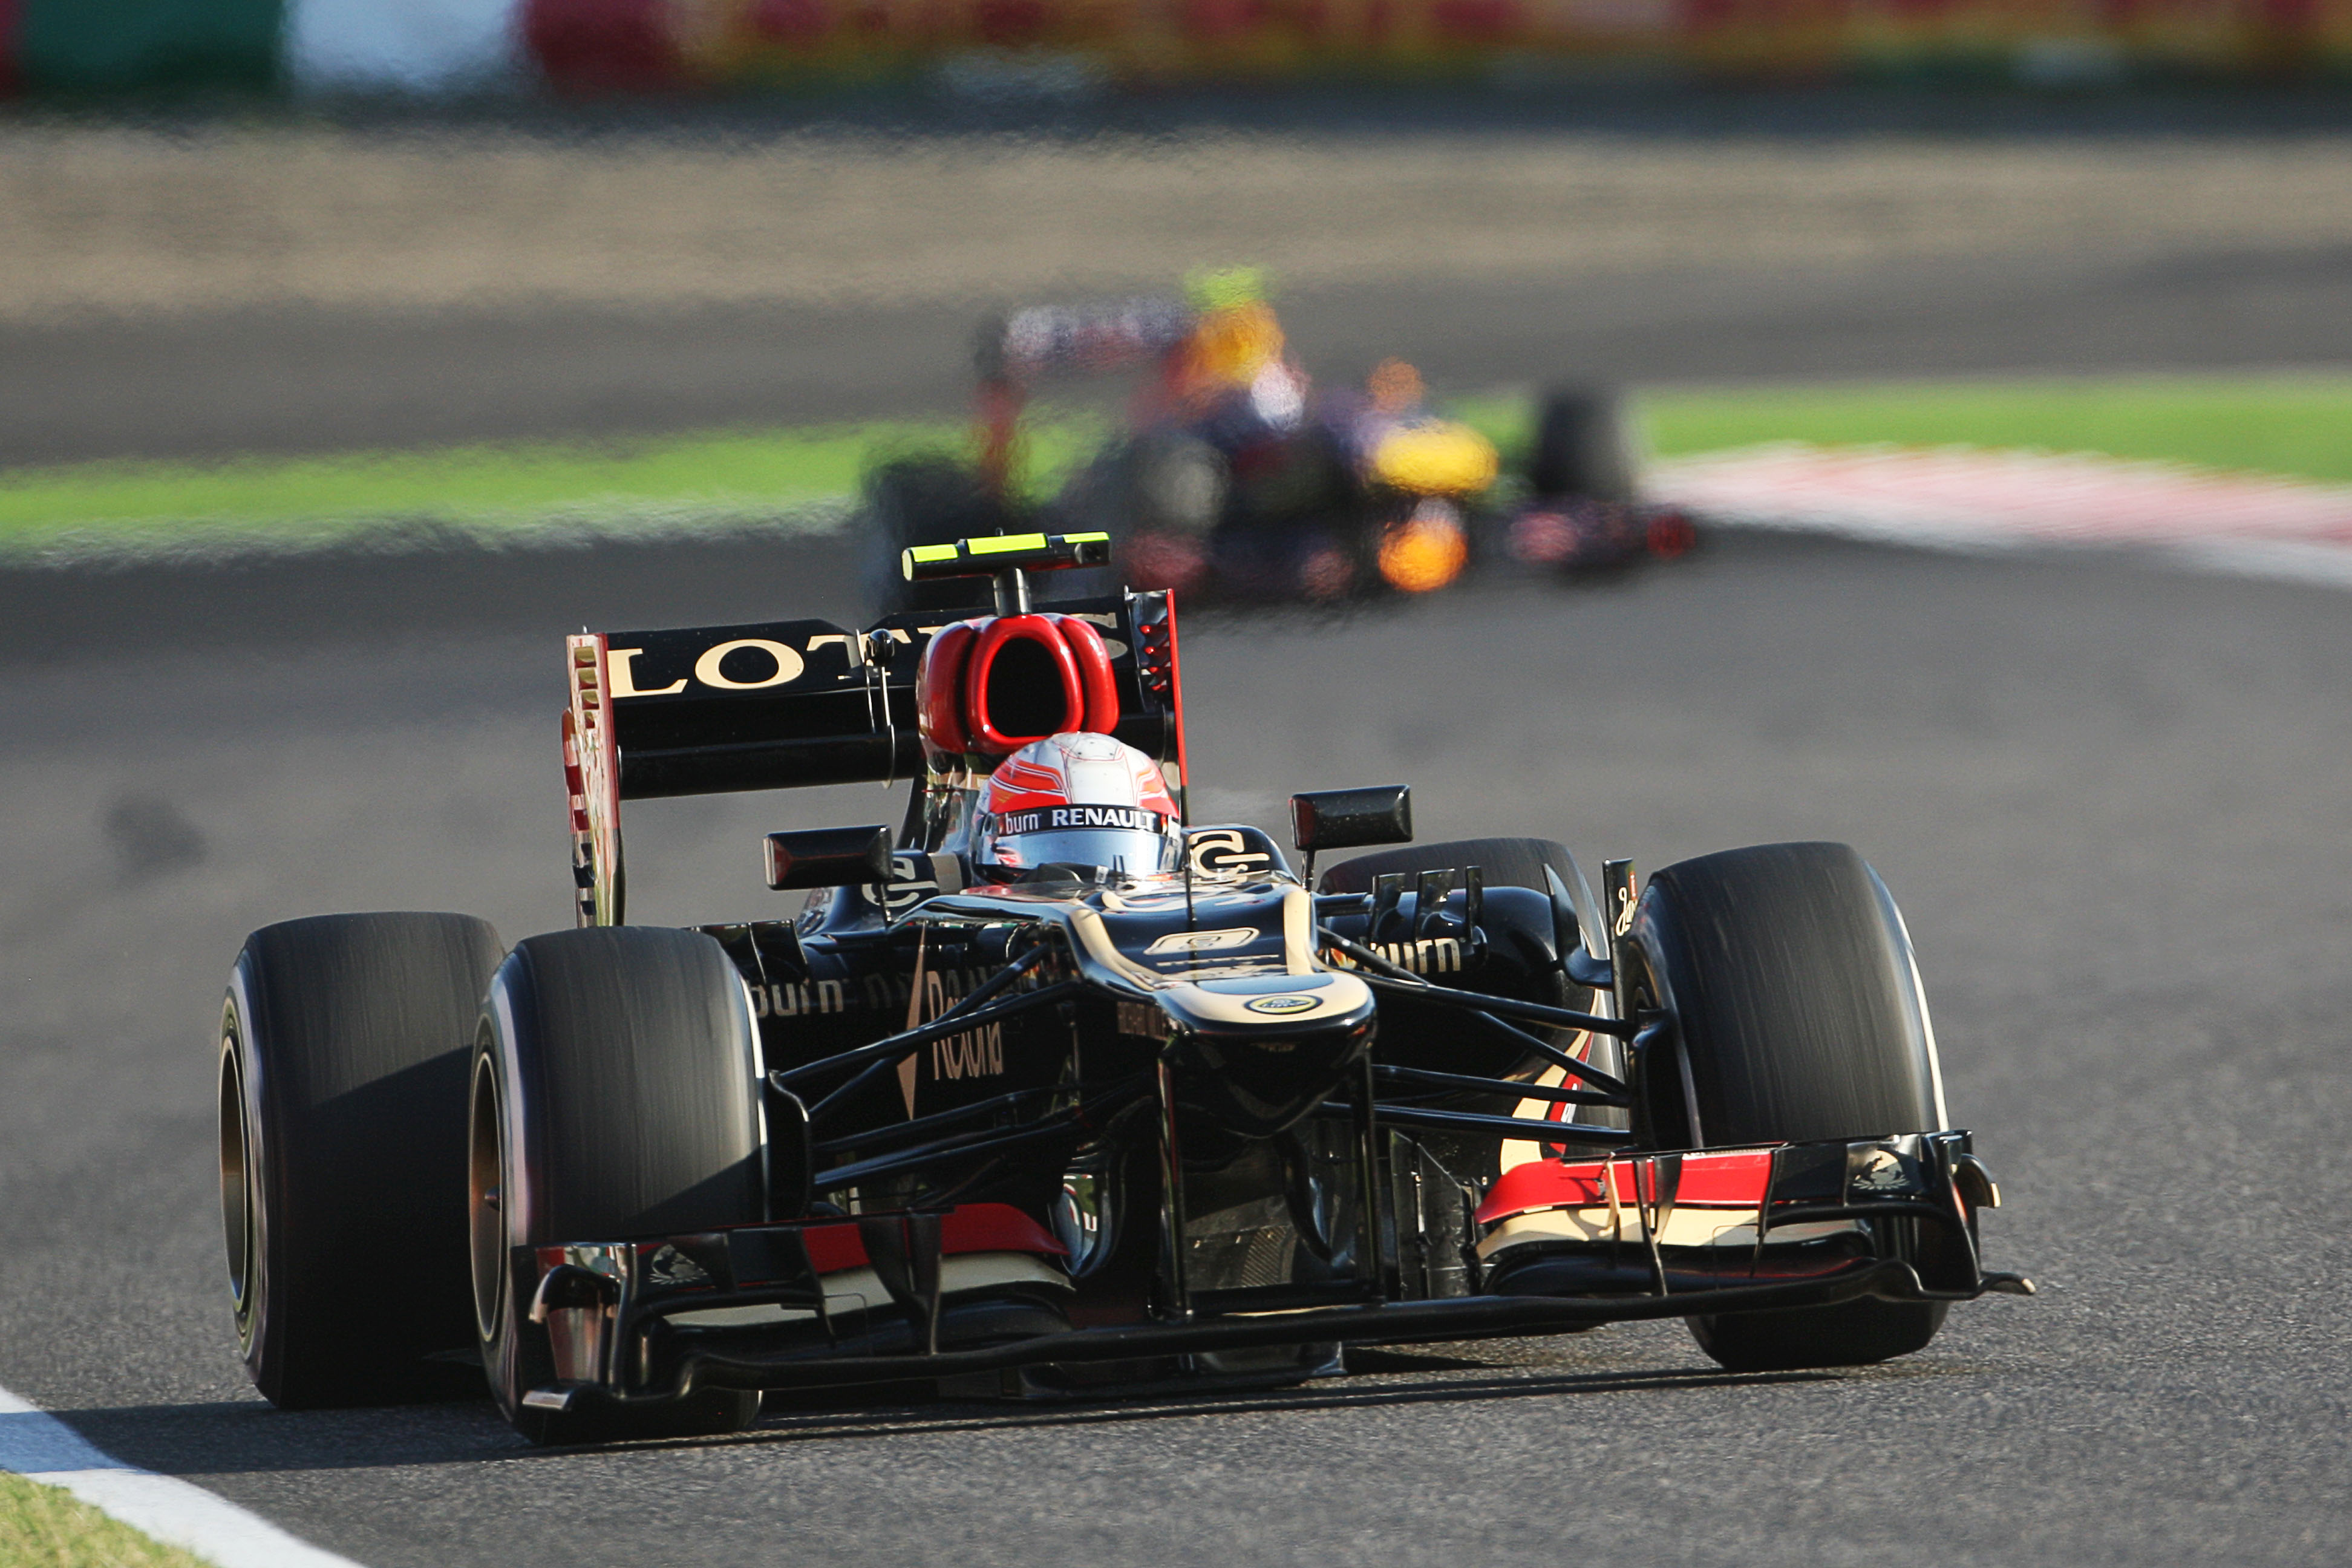 Romain Grosjean 2013 Japanese Grand Prix Suzuka Lotus Japan